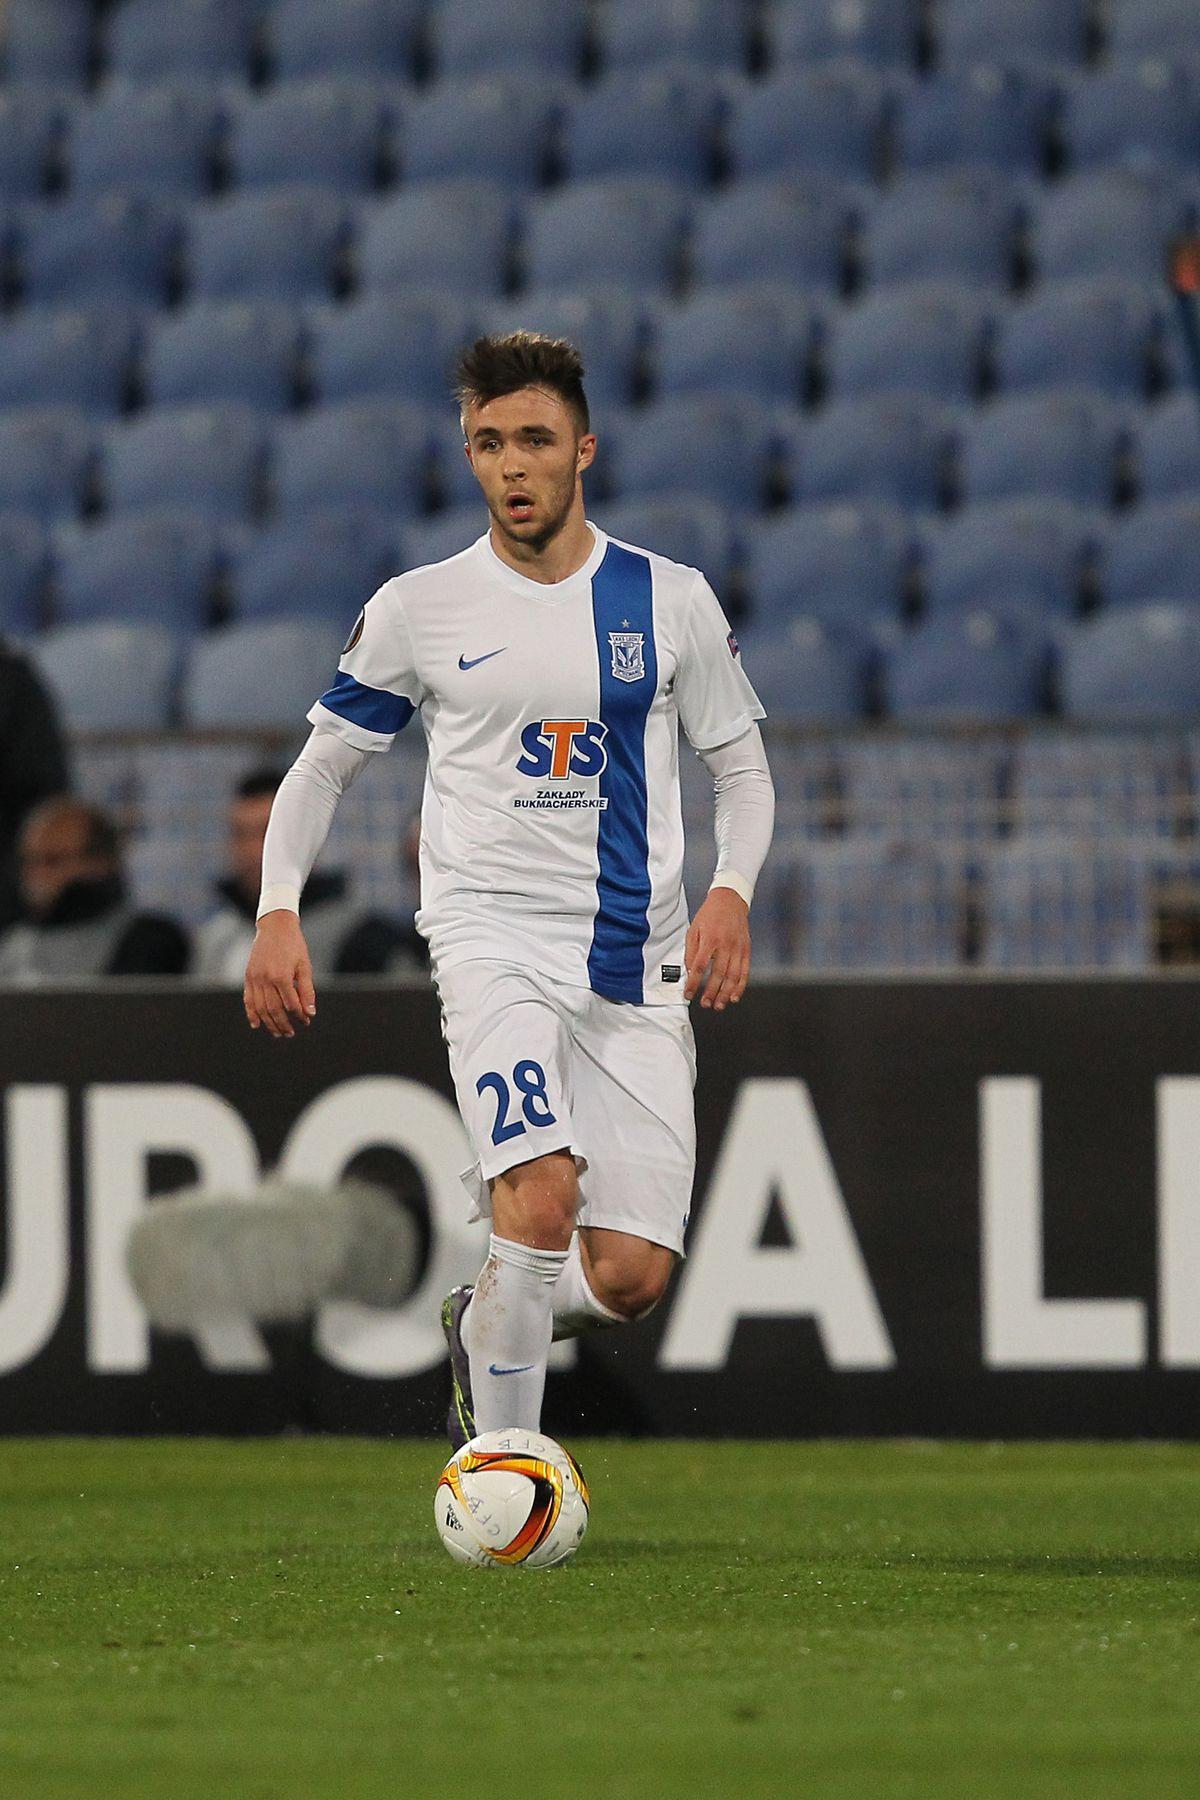 Os Belenenses v KKS Lech Poznan - UEFA Europa League